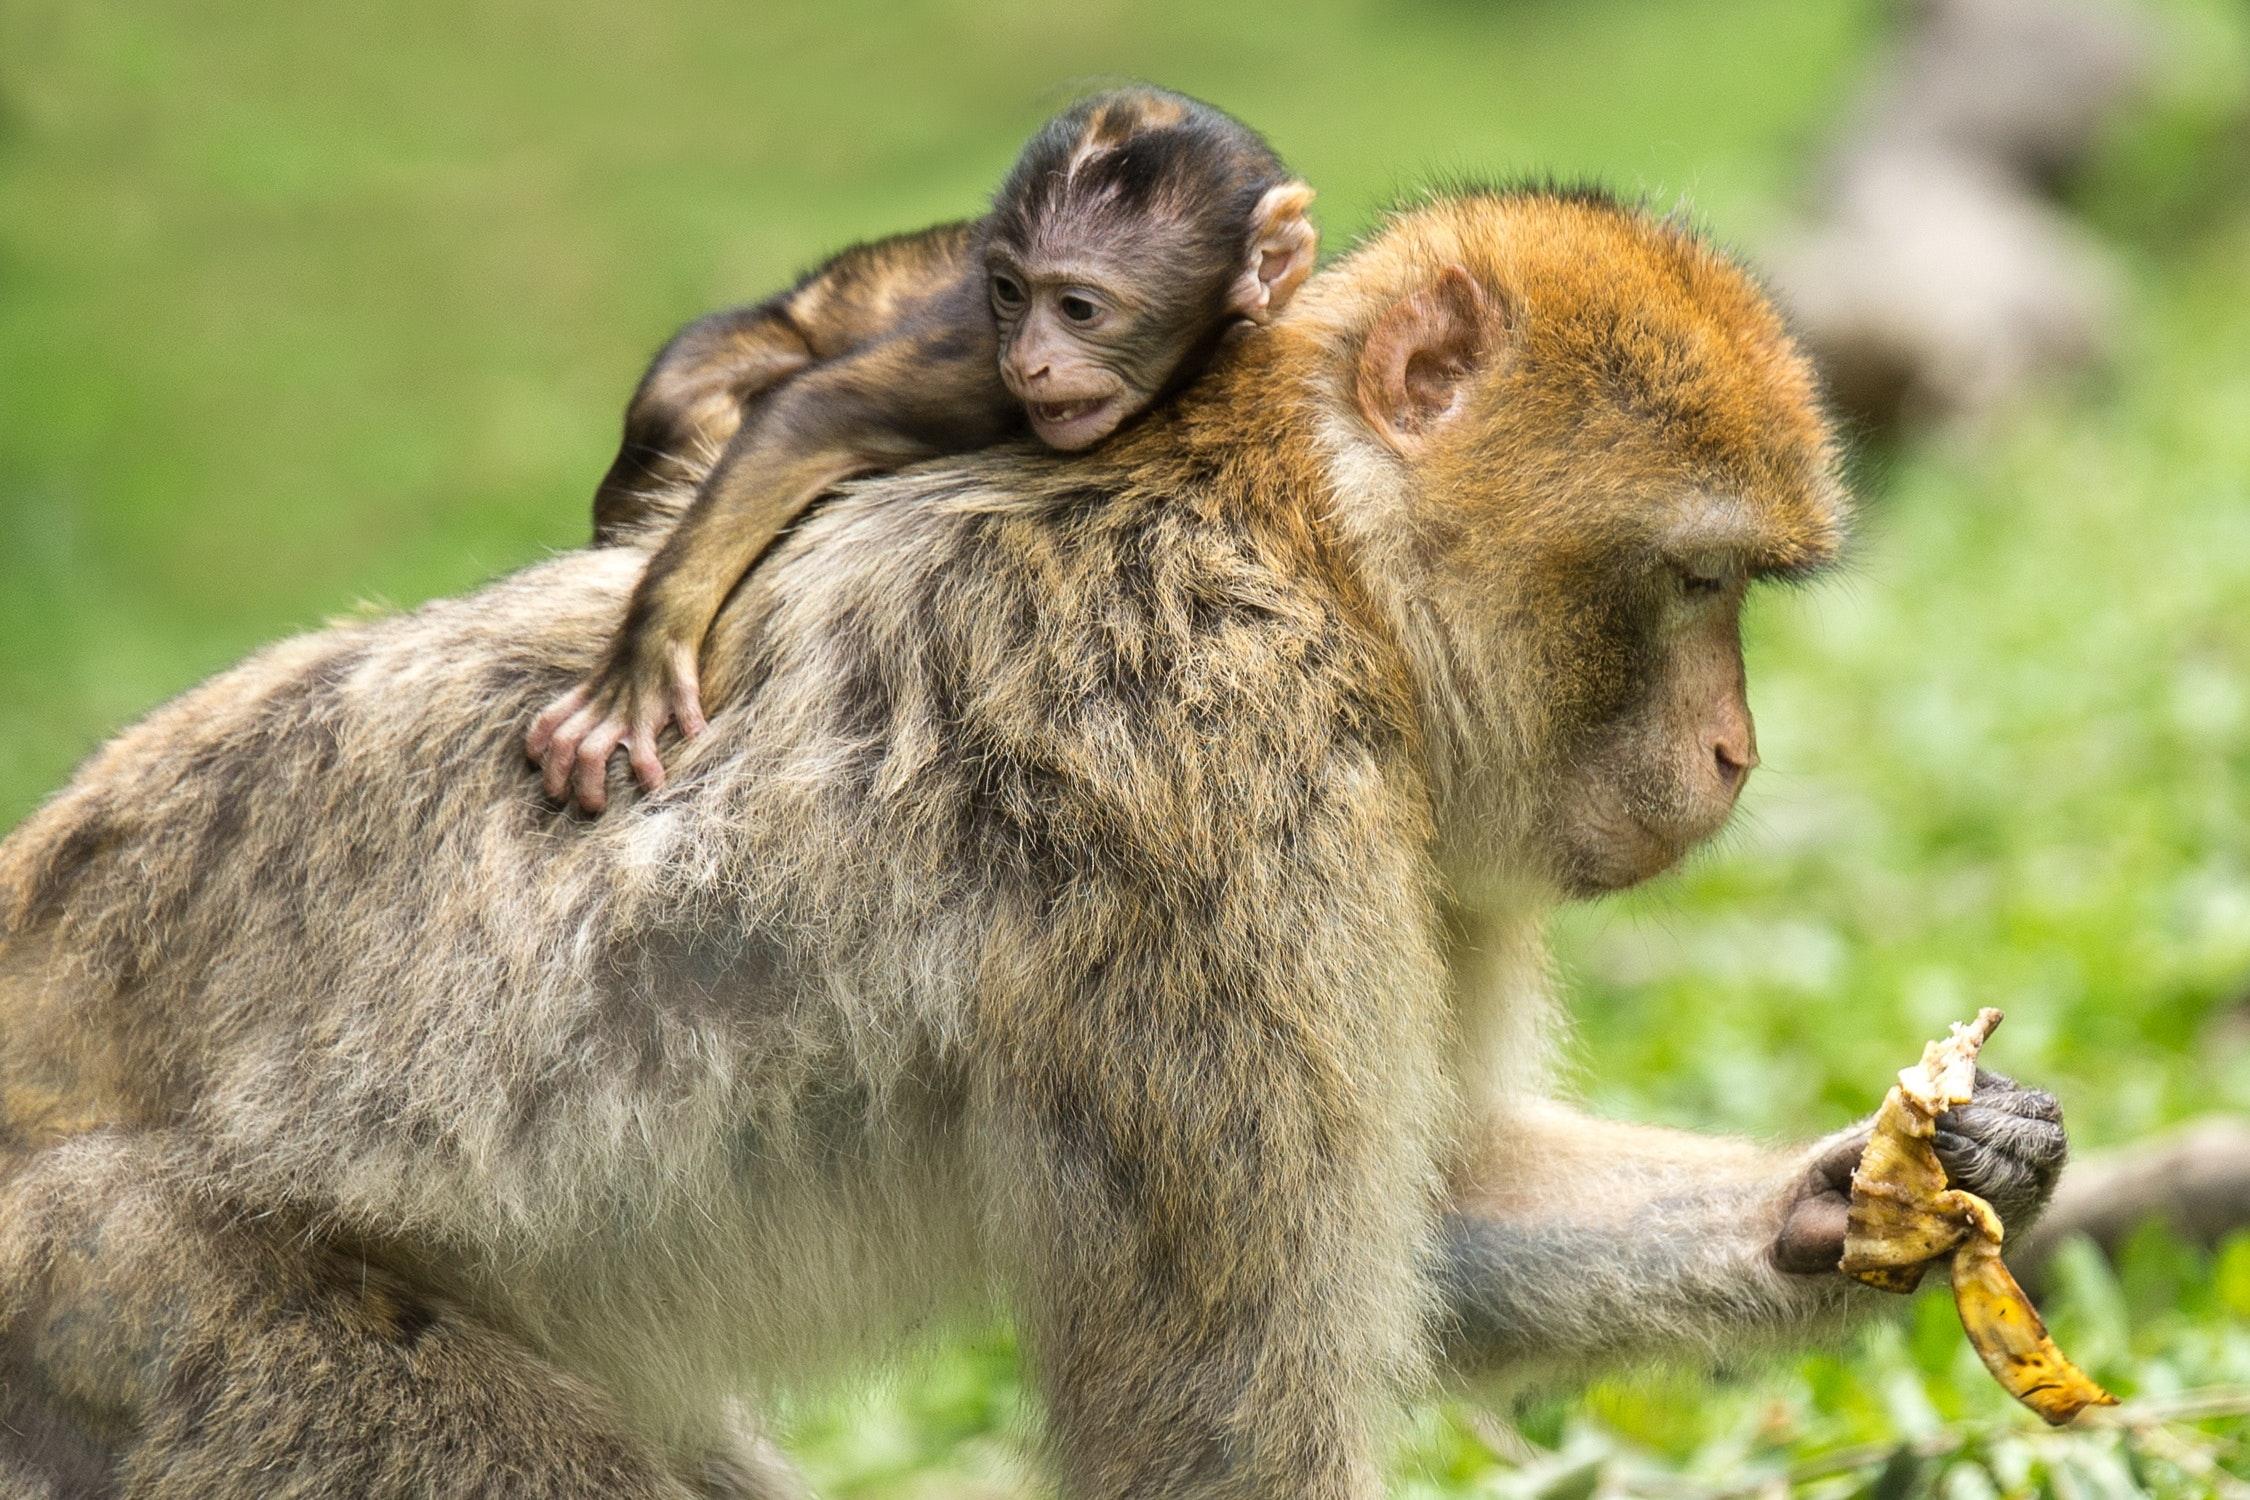 Baby monkey hanging at the back off adult monkey photo